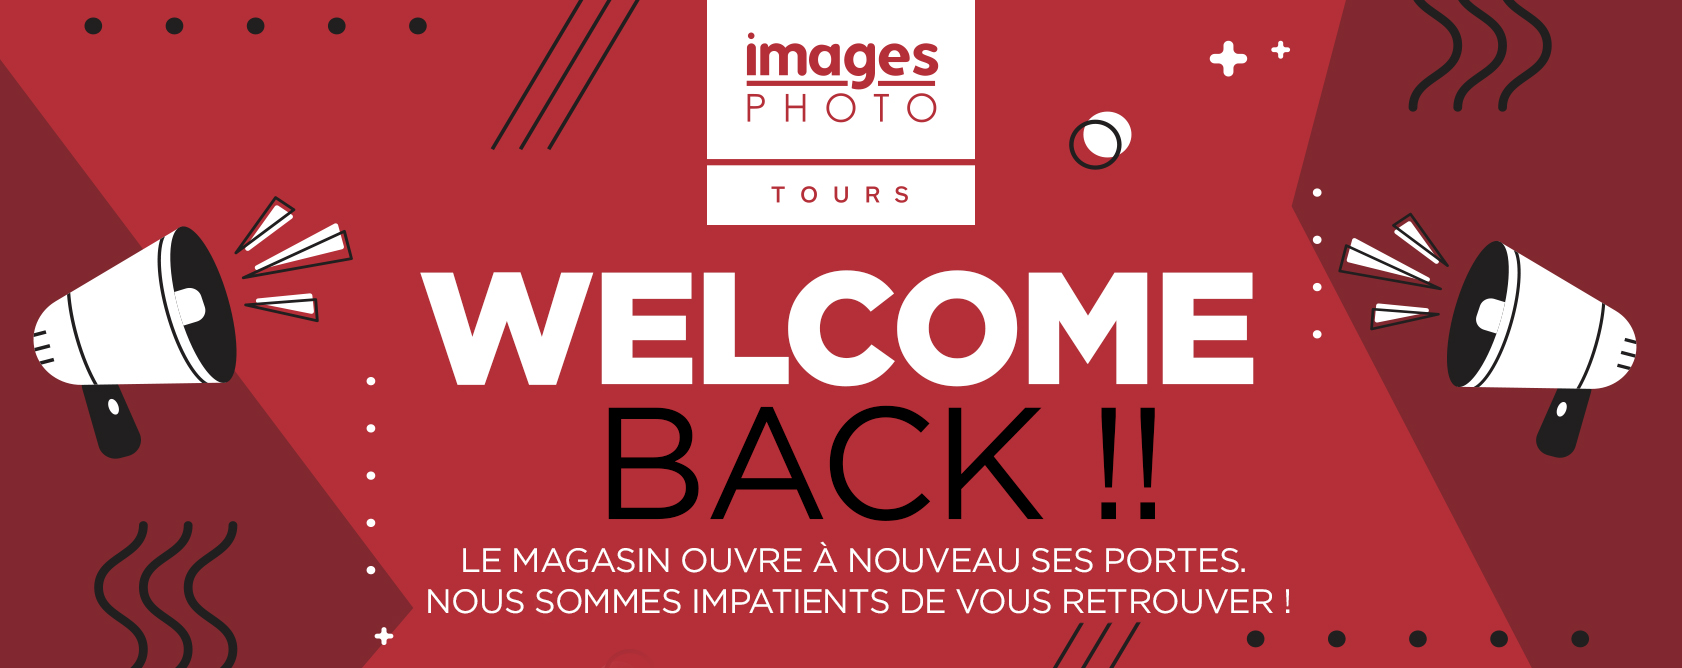 Welcom Back !